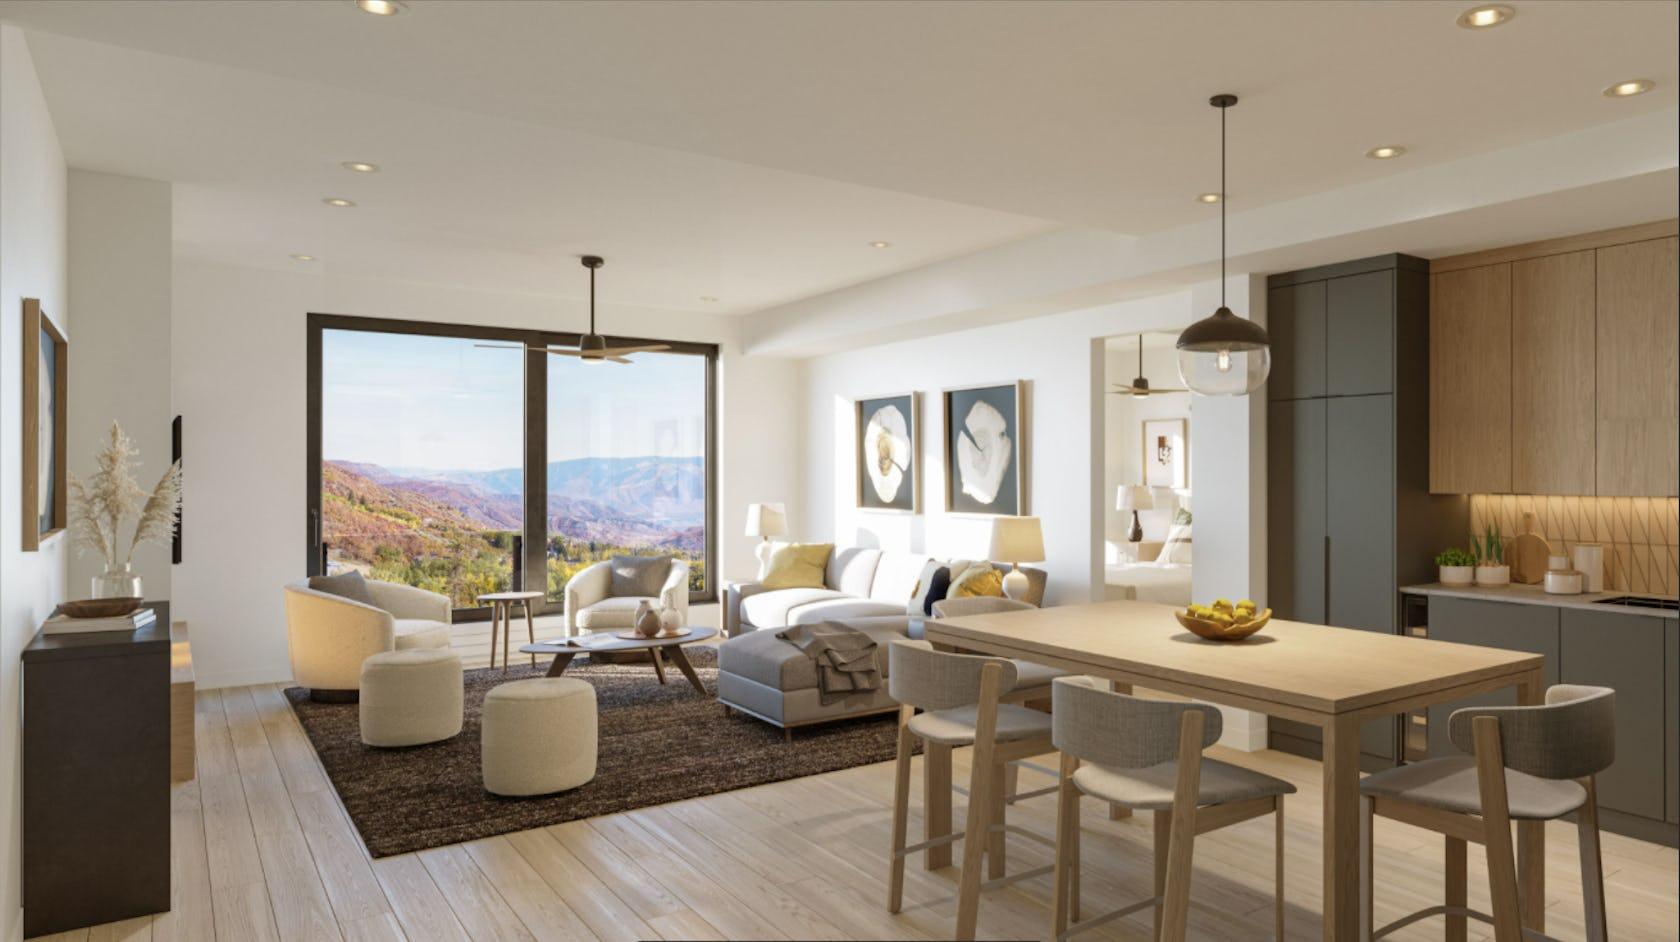 flooring interior design indoors chair furniture table housing wood living room room